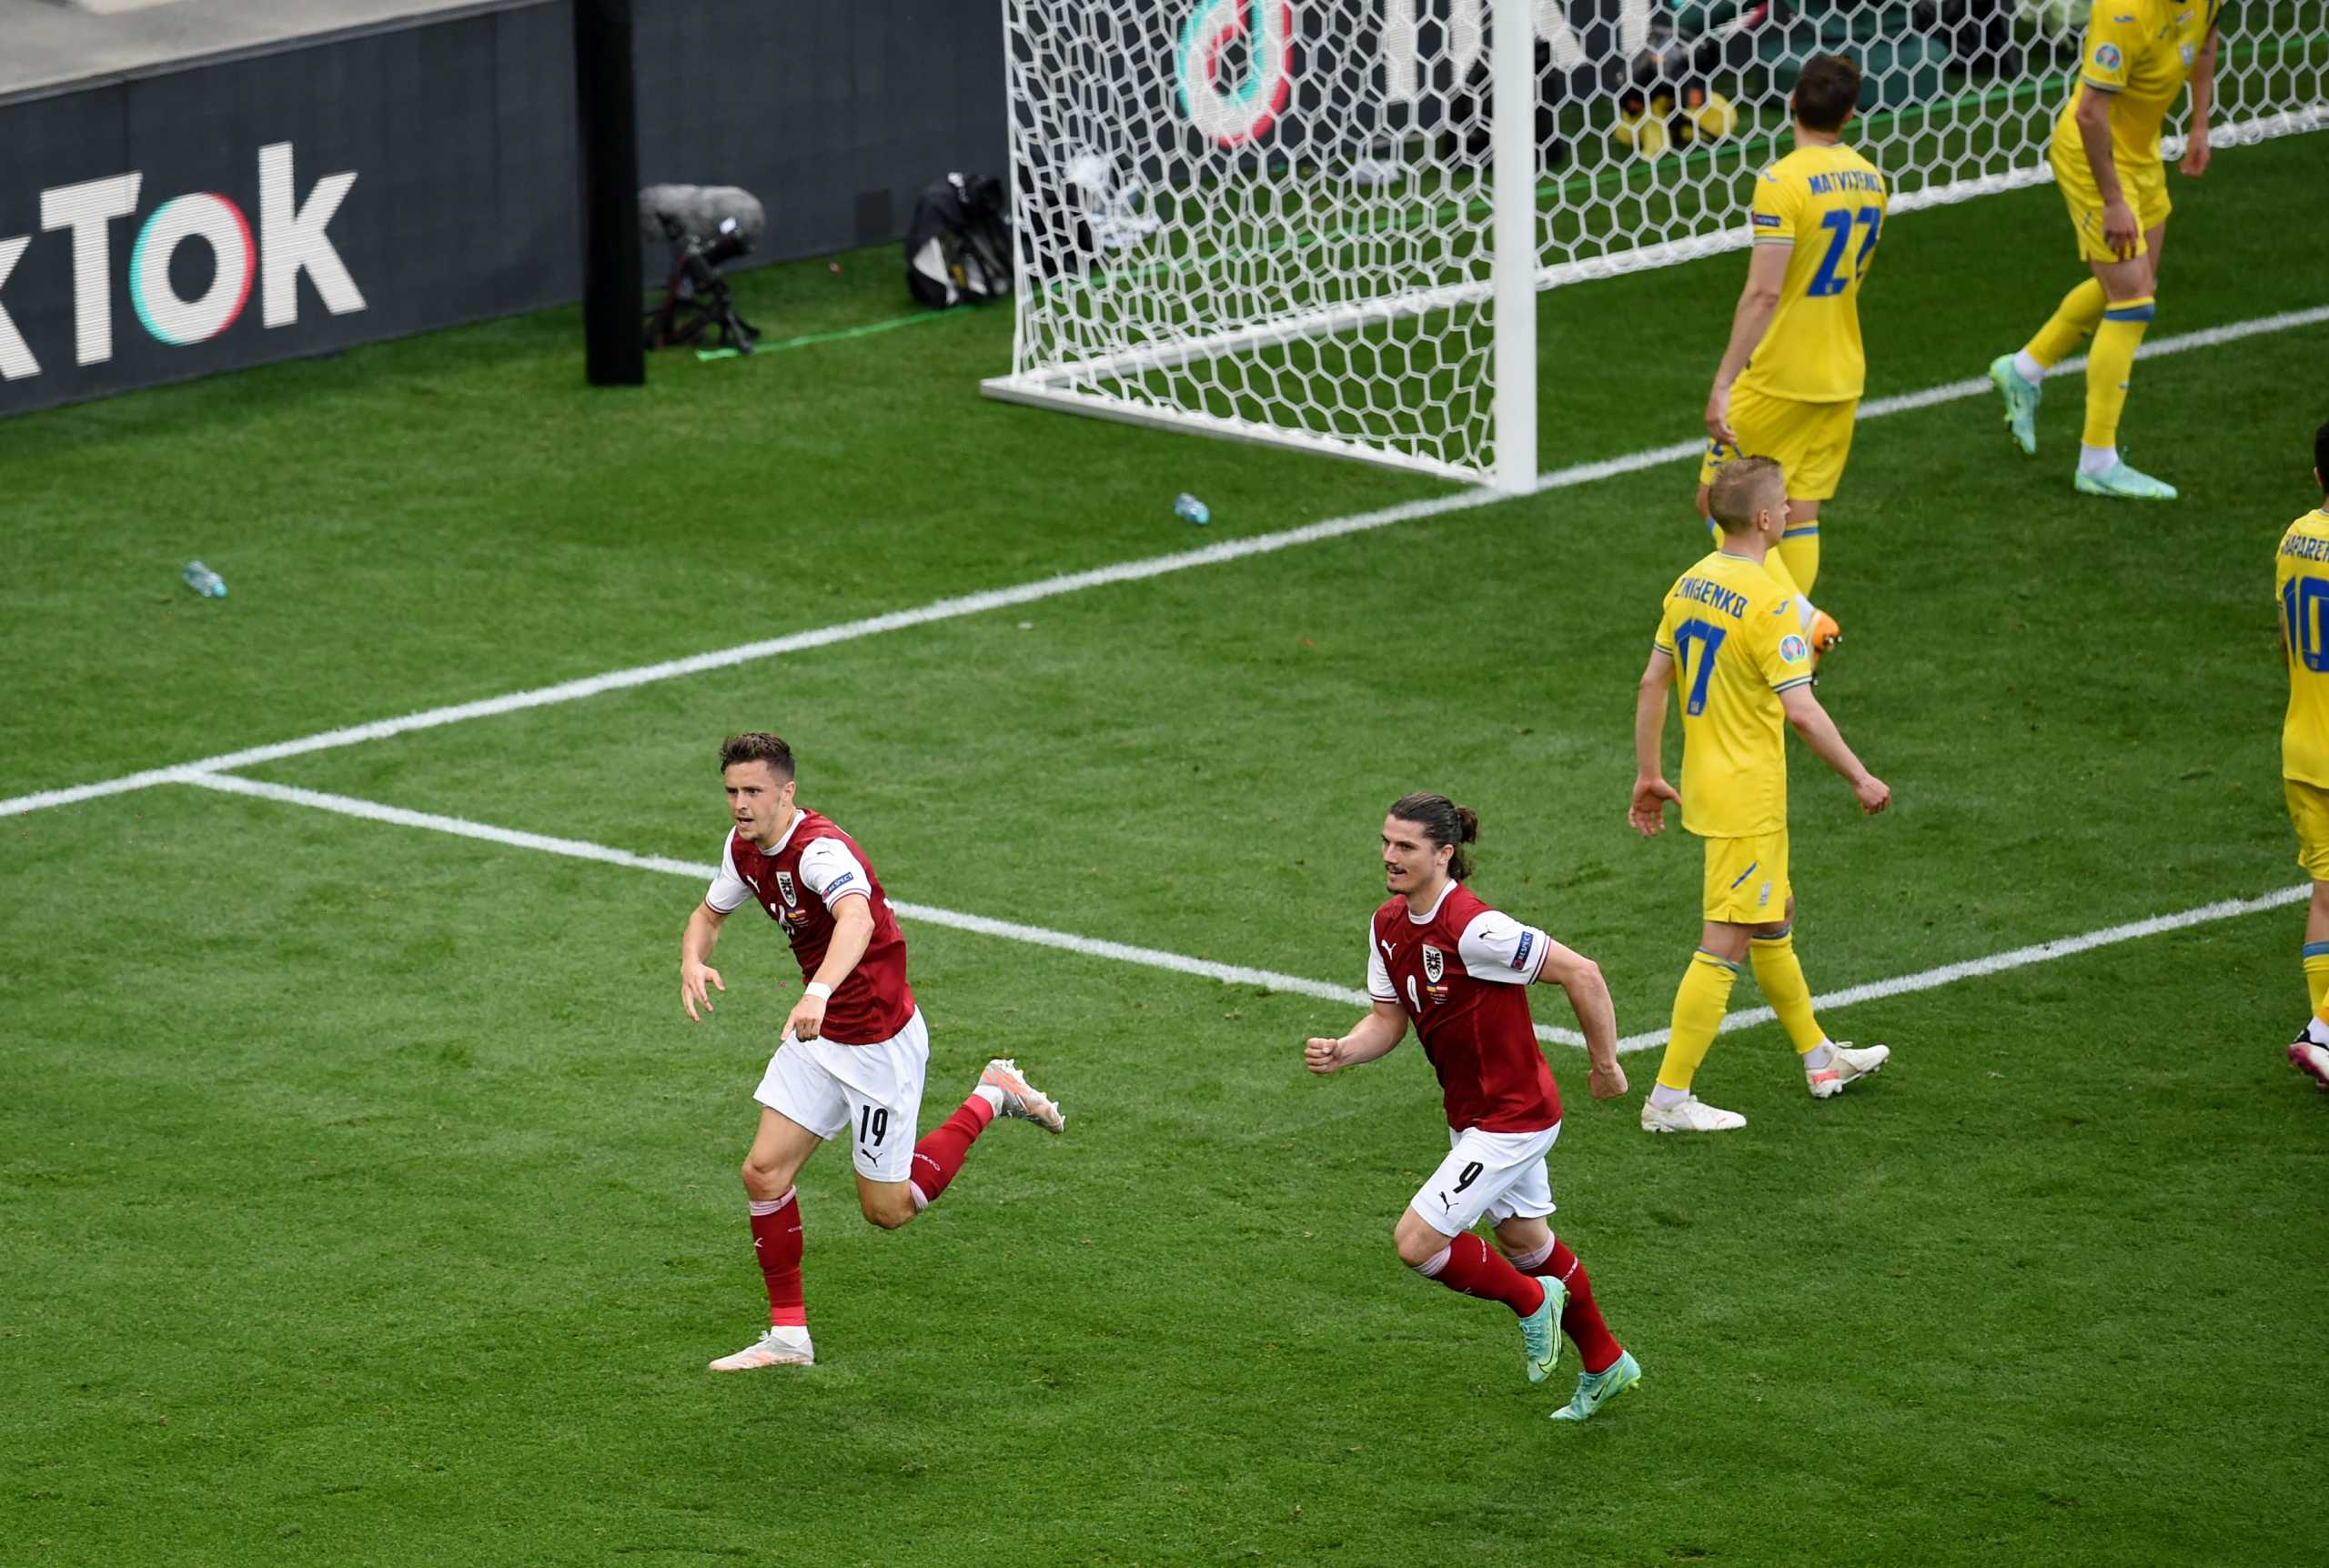 Euro 2020, Ουκρανία – Αυστρία: Προβάδισμα πρόκρισης με Μπάουμγκαρτνερ για τους Αυστριακούς